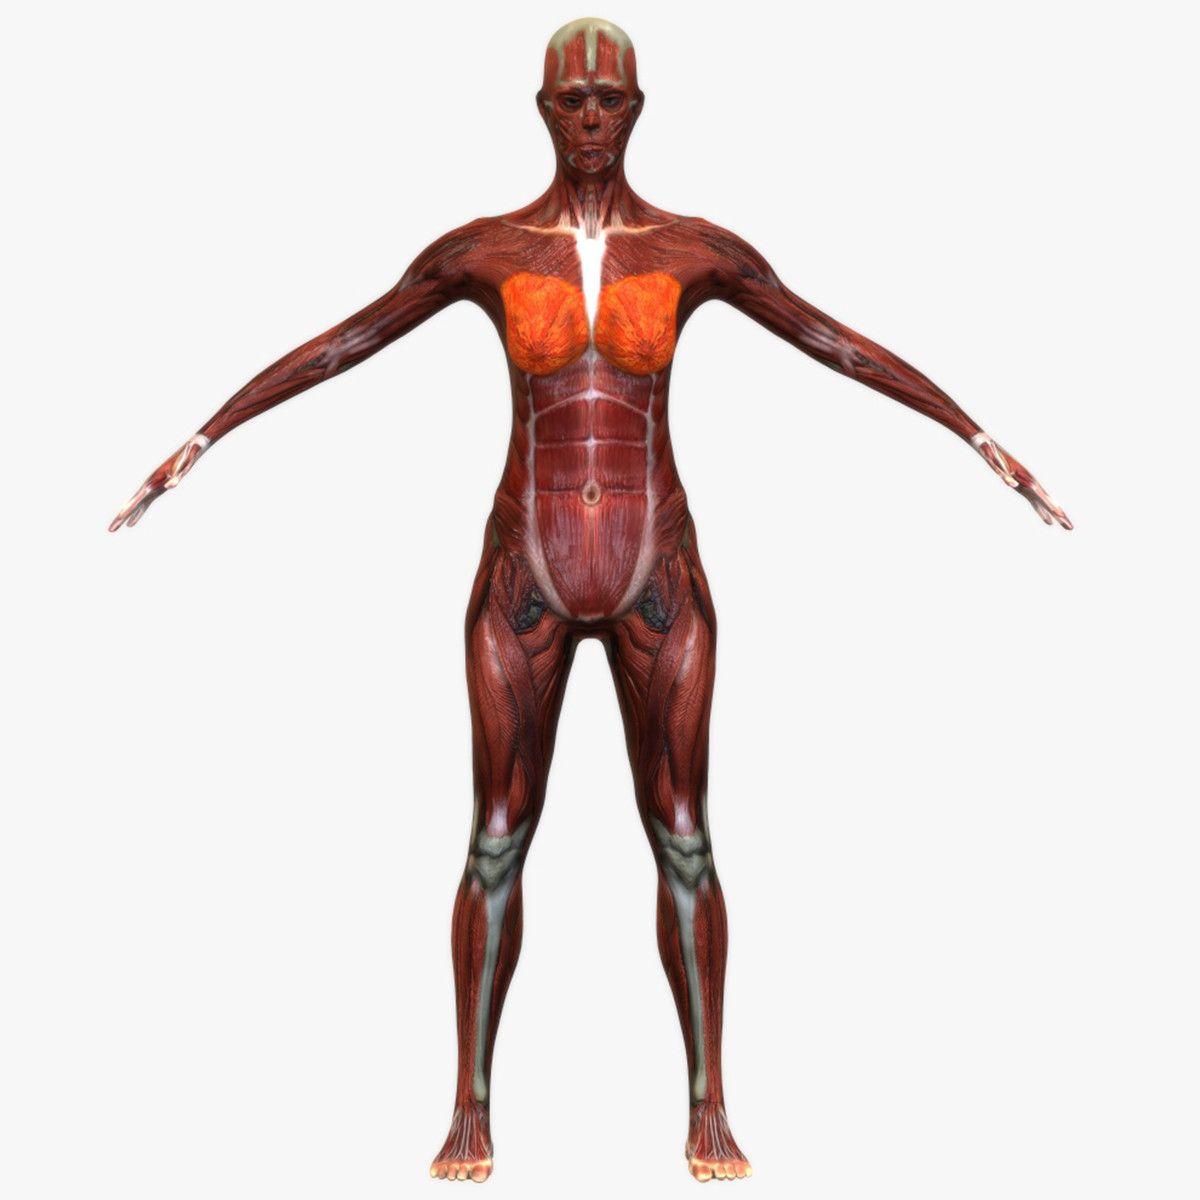 3d model female muscular anatomy   Medical   Pinterest   3d anatomy ...